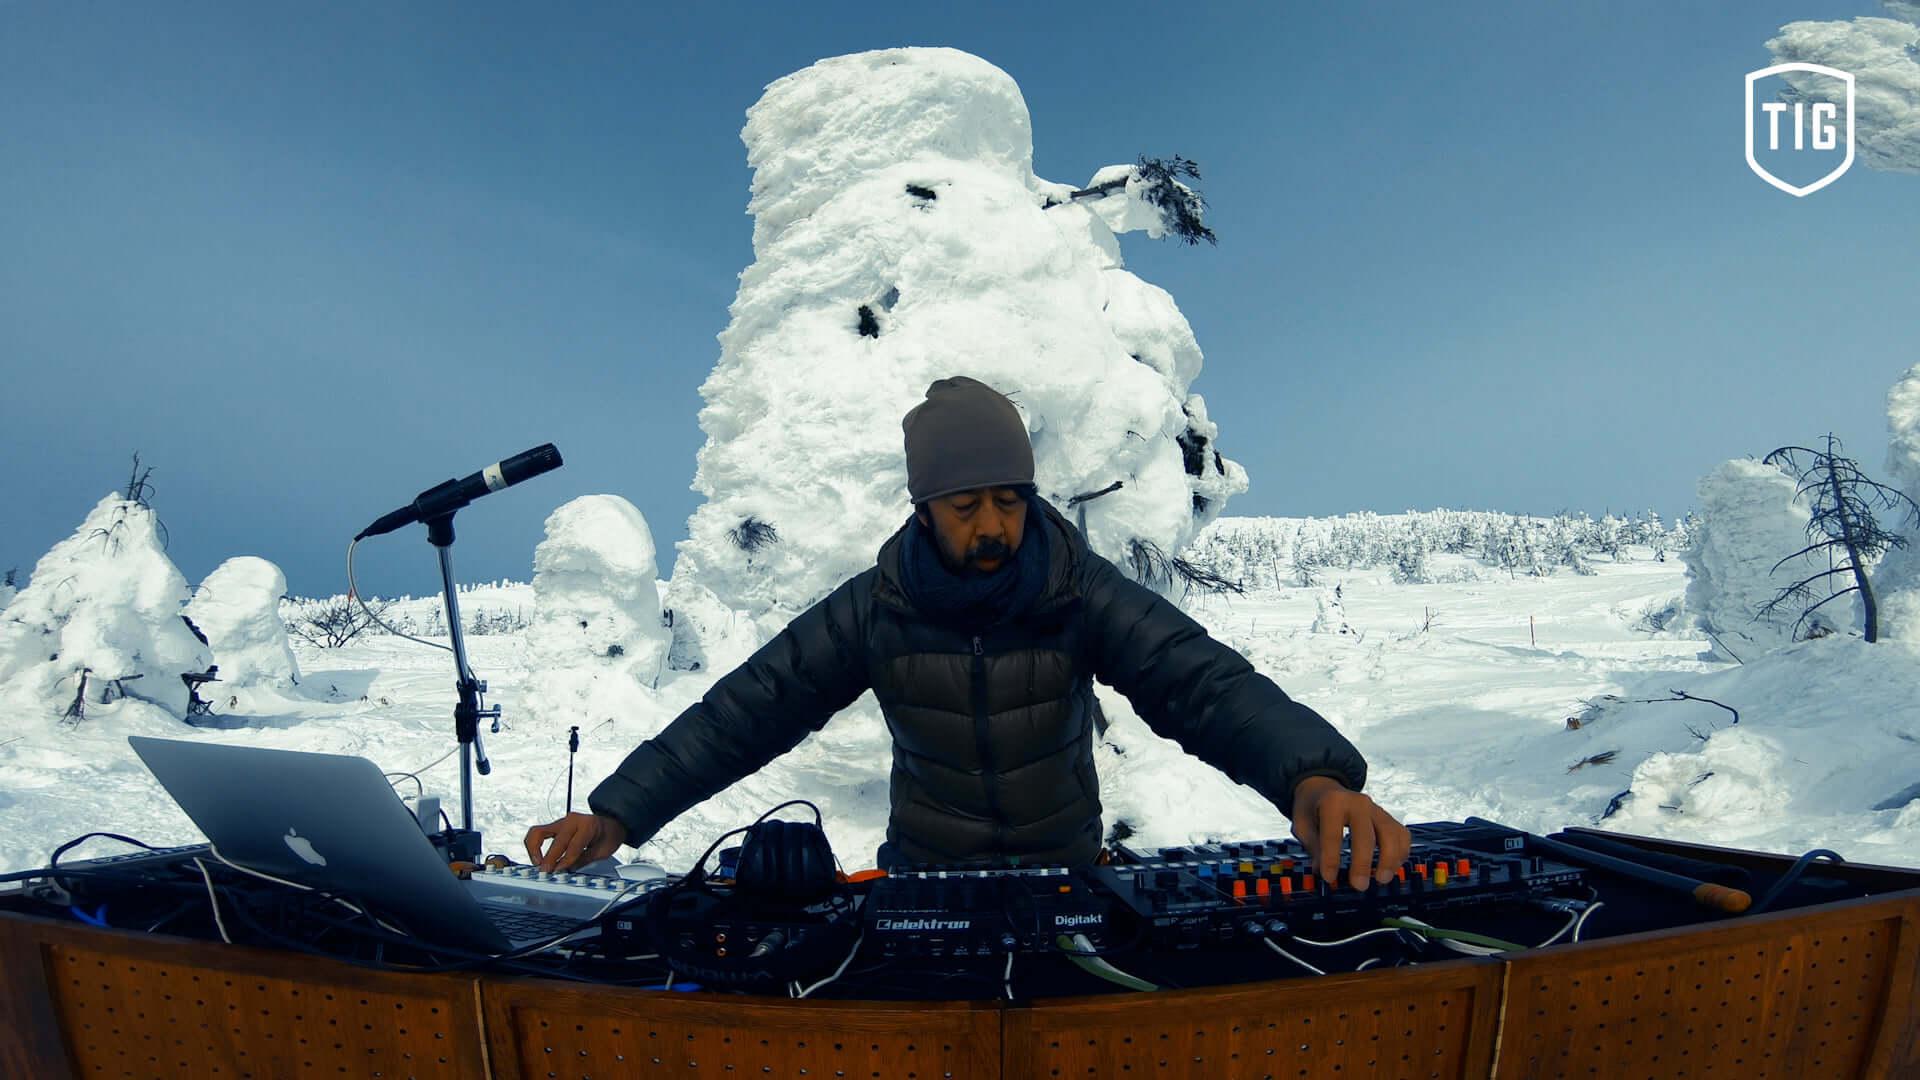 Kuniyuki Takahashiがマイナス6度の樹氷原で完全即興テクノライブを敢行!絶景音楽配信メディア「That Is Good」第7弾のショートPVが解禁 music210301_thatisgood_4-1920x1080